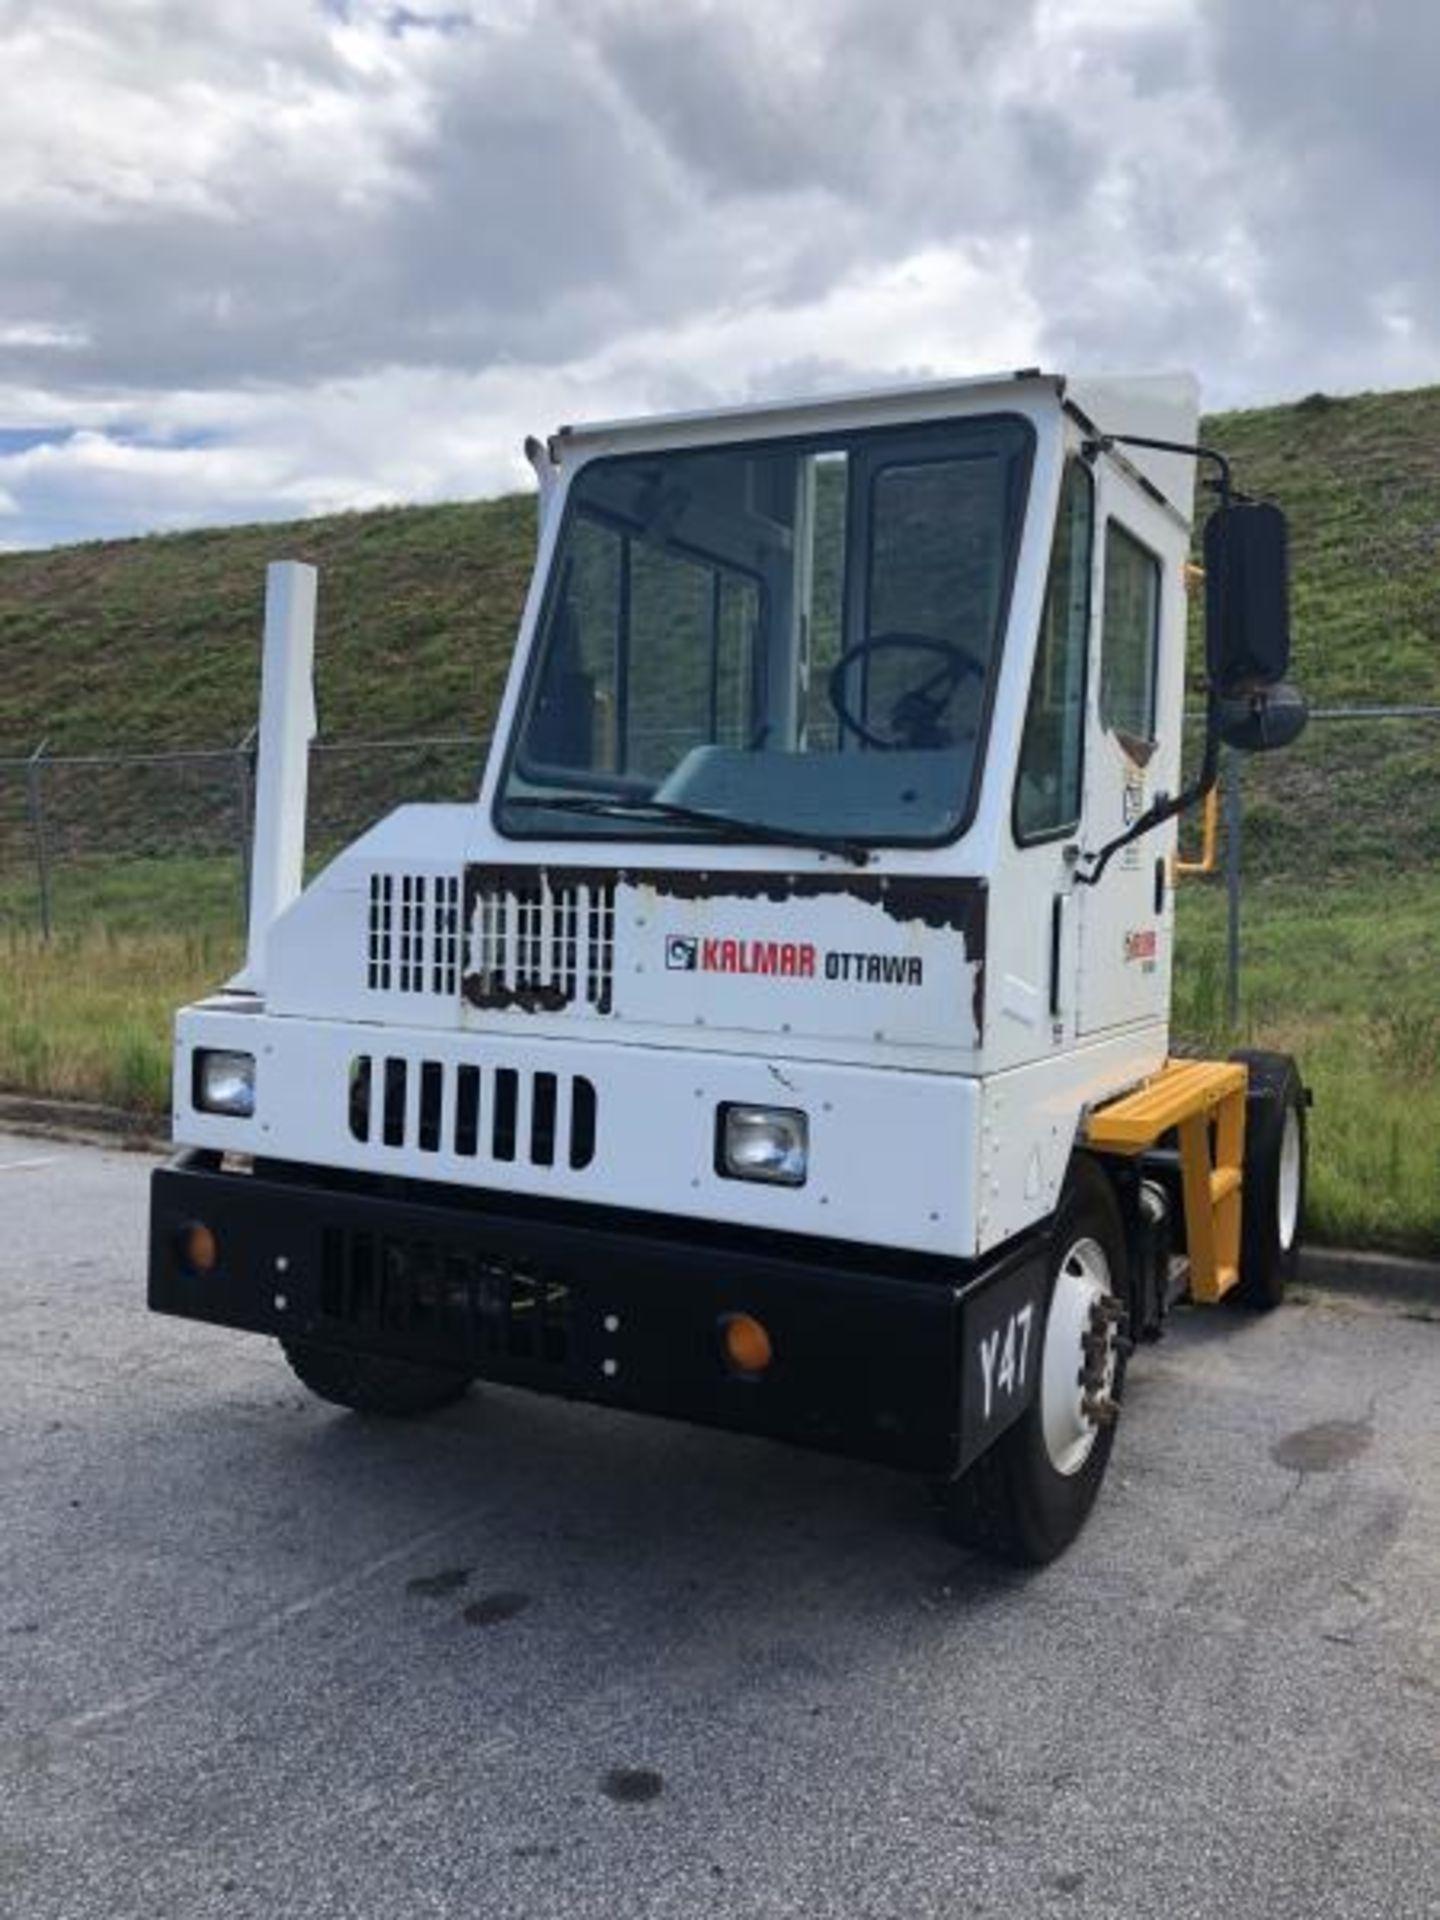 2015 Kalmar Ottawa 4x2 Yard Truck , SN: 338841 4,267.2 Hours, 1,683 Miles - Image 34 of 34